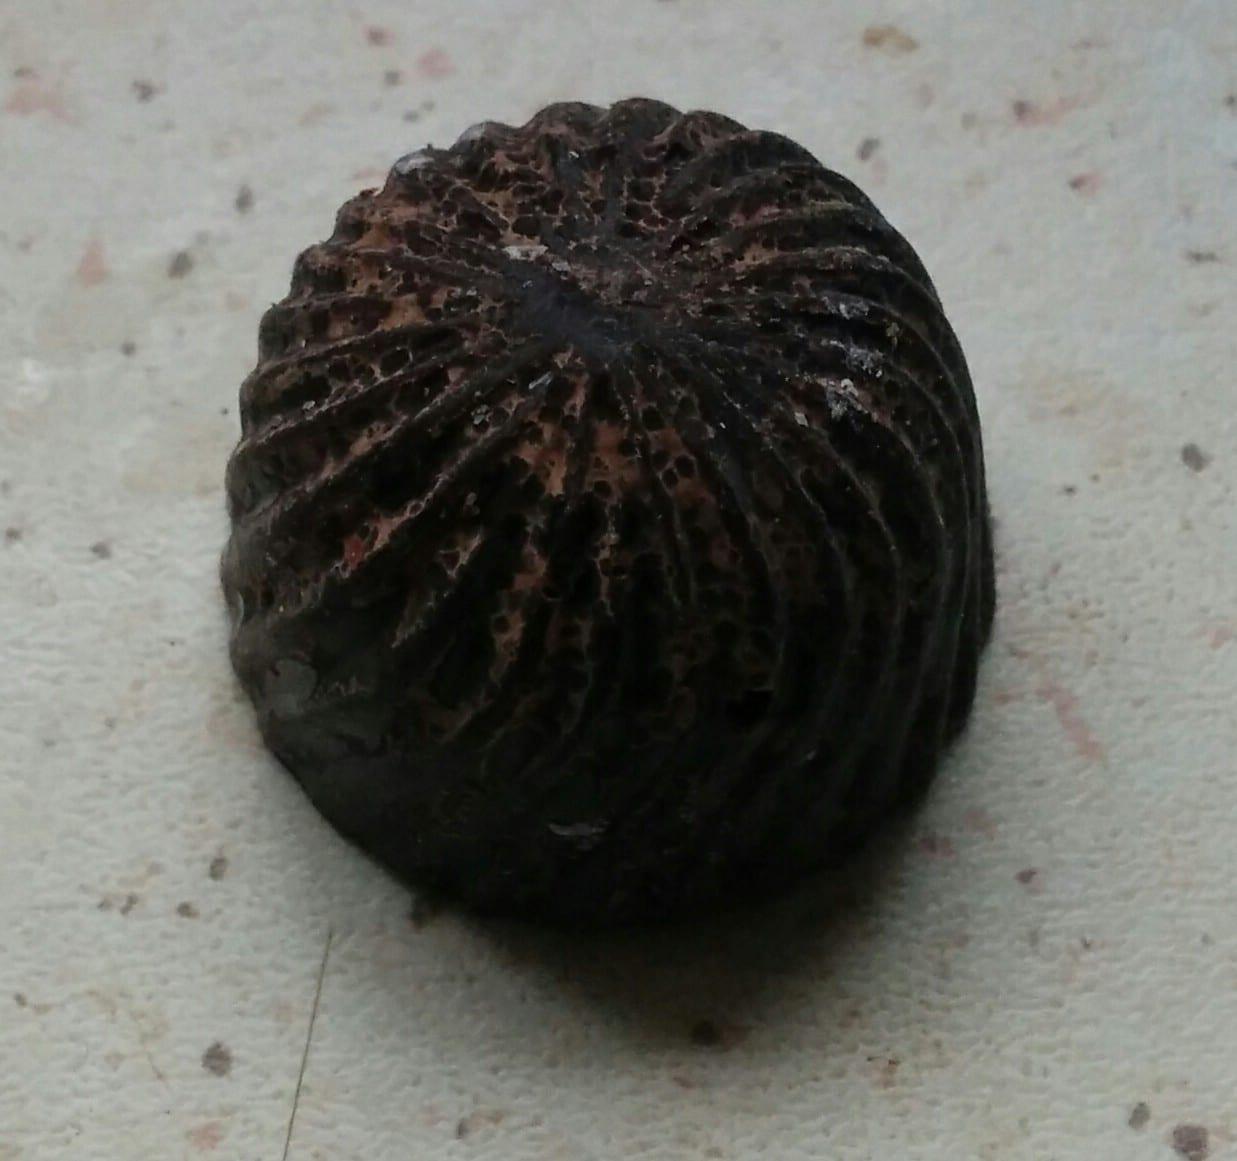 Hjemmelaget konfekt stygt utseende